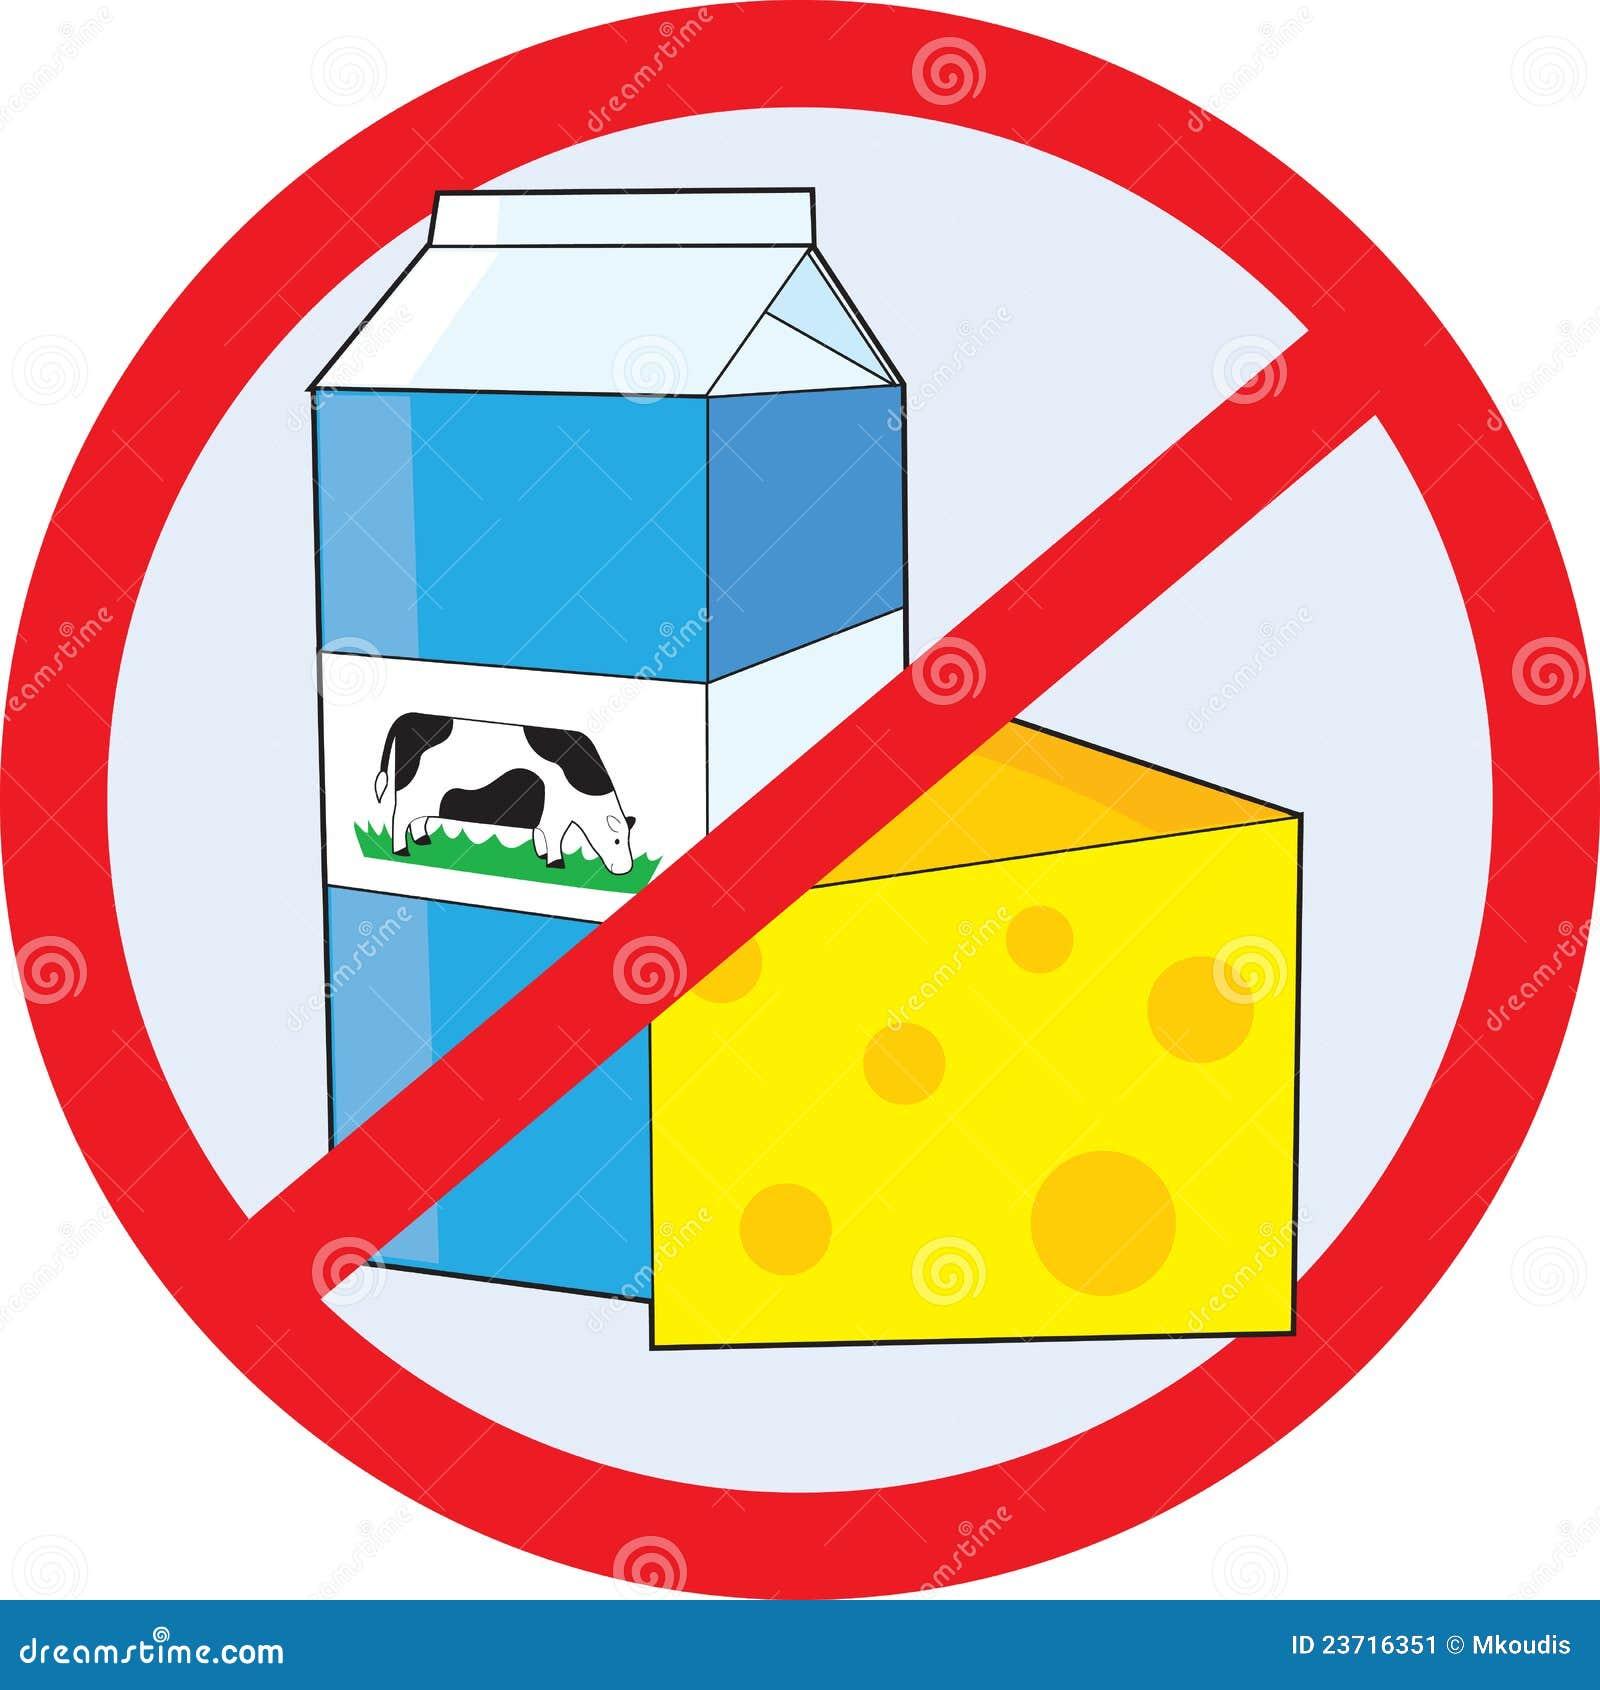 no dairy stock image image 23716351 yard sale clip art free yard sale clip art free use